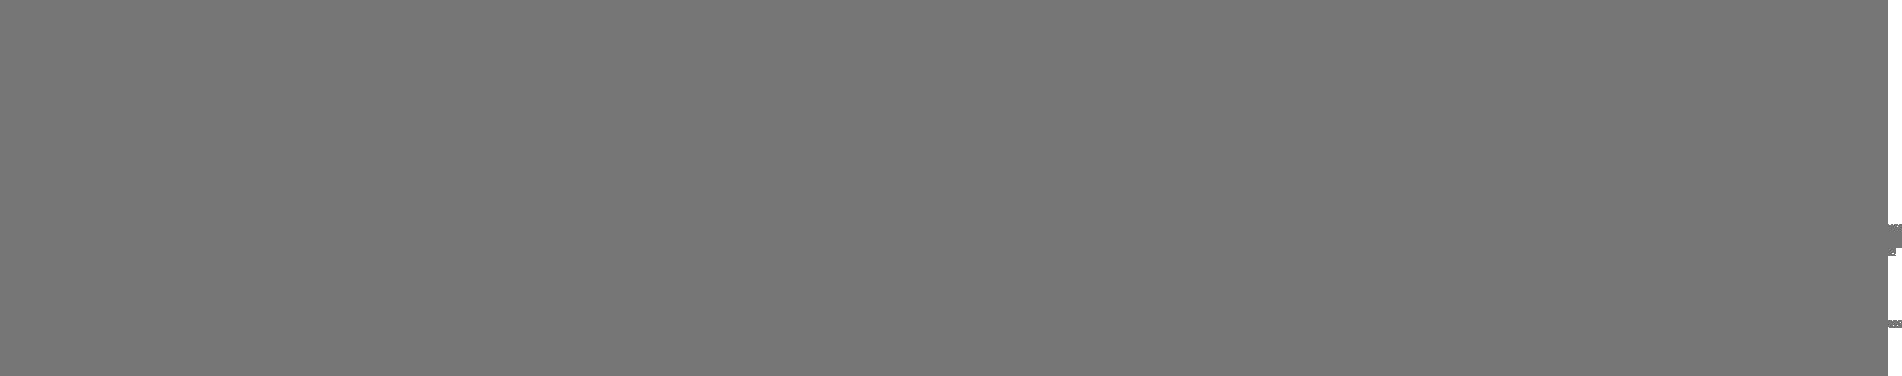 [www.institutcinthya.be][933]phytomer-quadrieorig